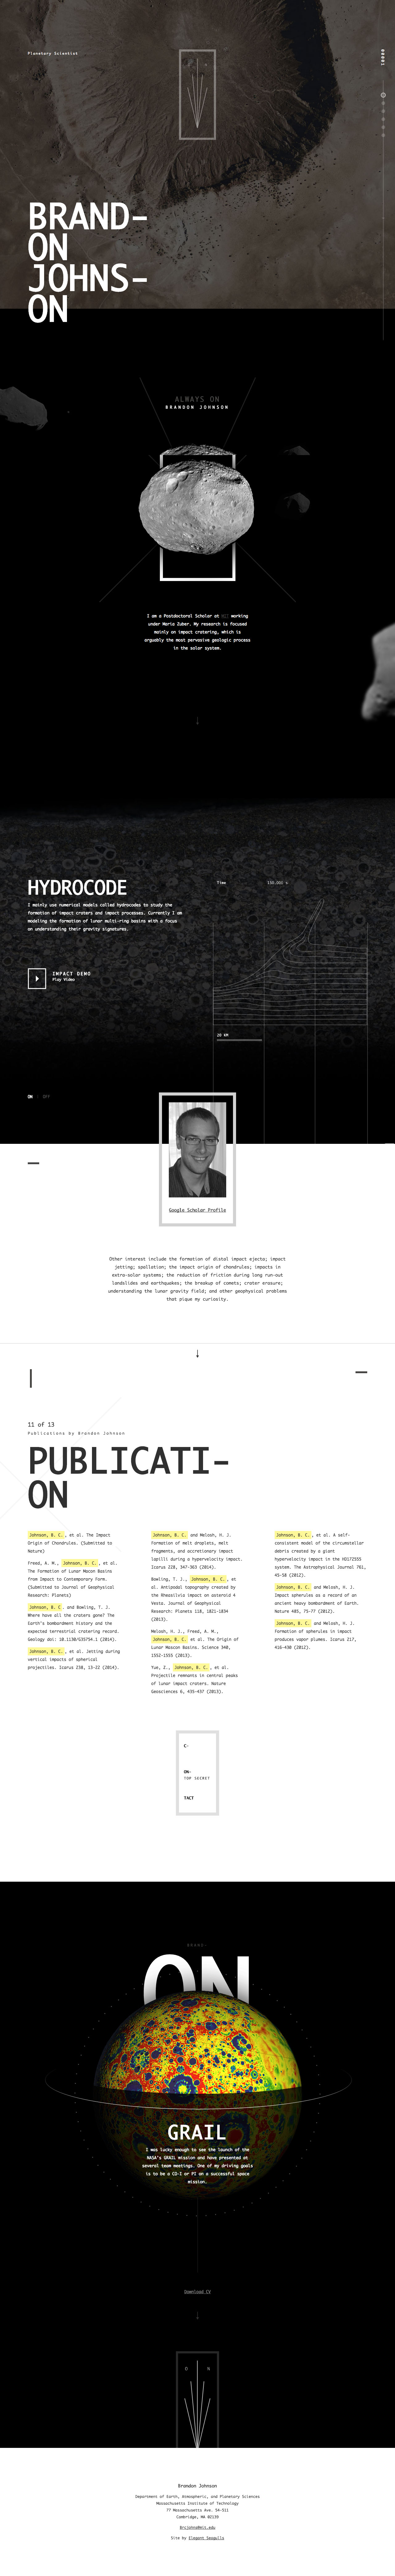 Brand-On Johns-On Website Screenshot